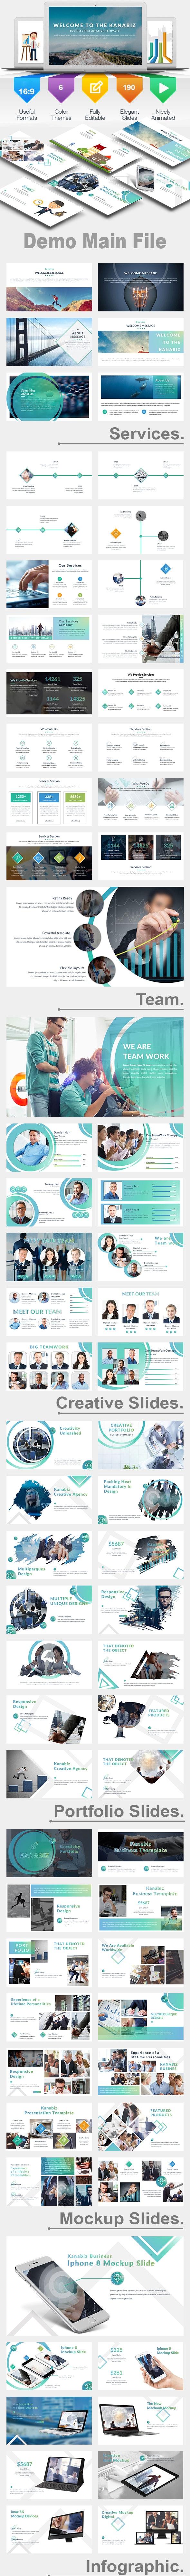 Kanabiz Business PowerPoint Template - Creative PowerPoint Templates